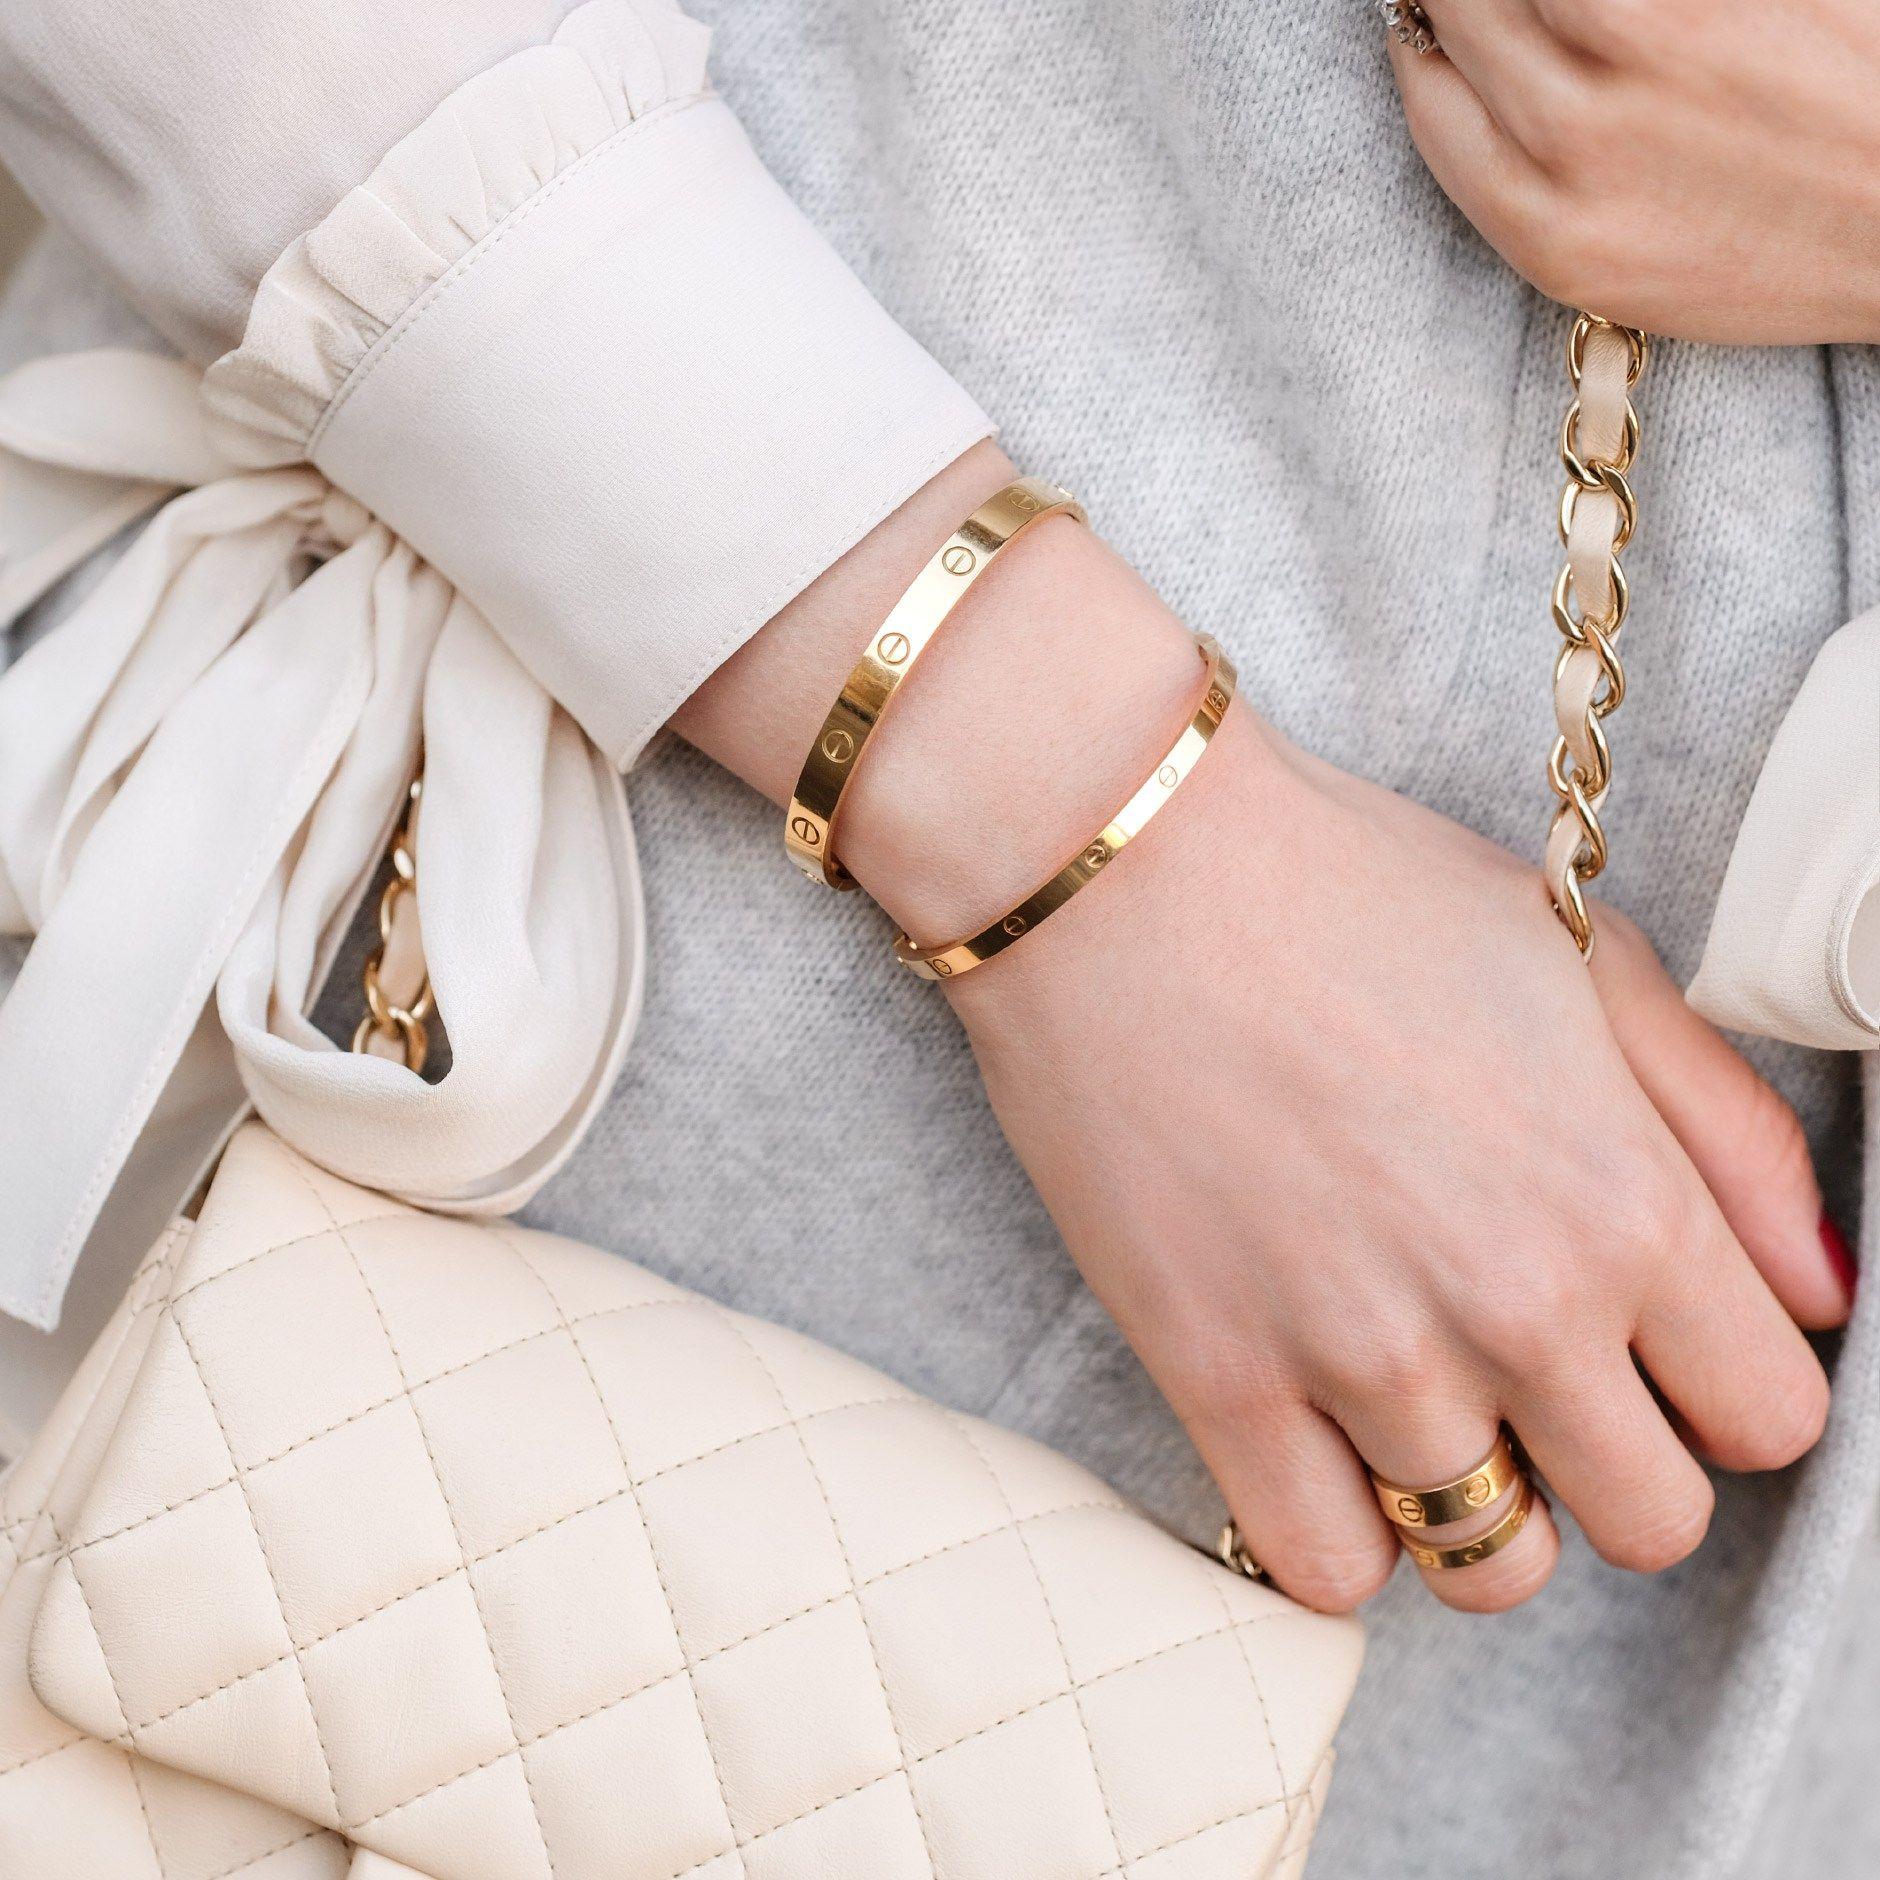 5828c81727630 Almost Spring | Fashion | Cartier bracelet, Jewelry, Bracelets